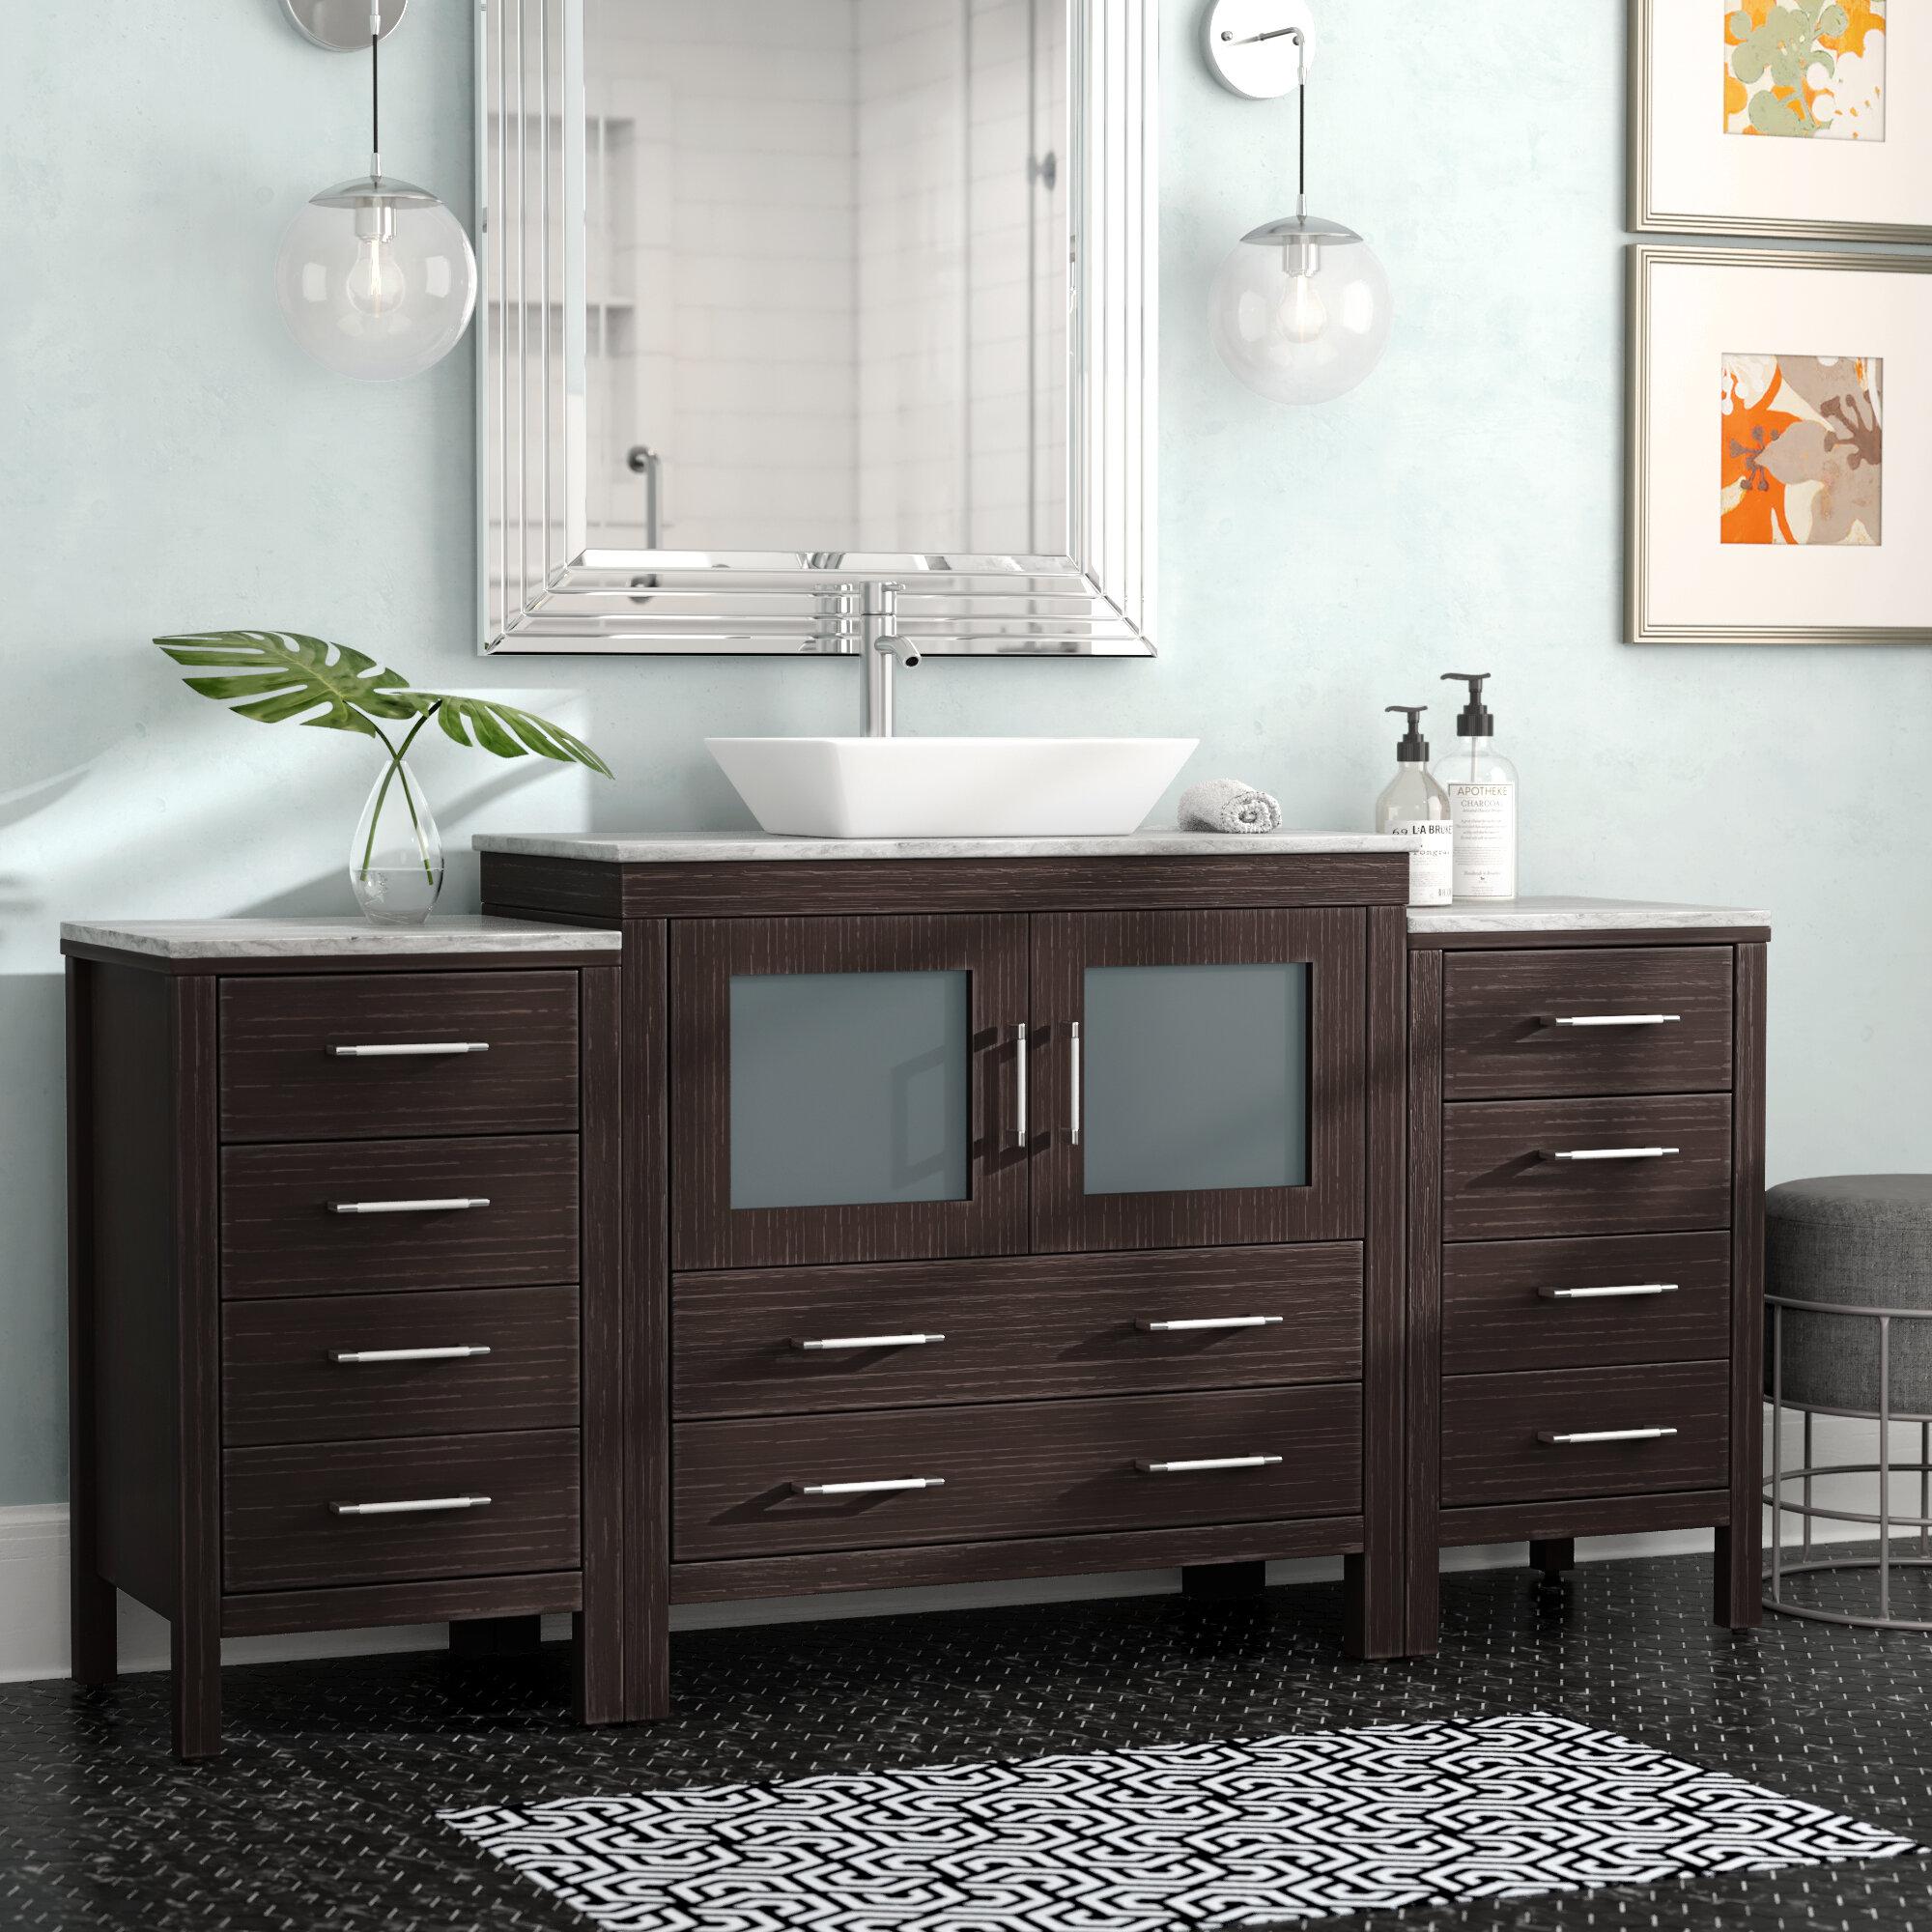 stanardsville 68 single bathroom vanity set with white marble top